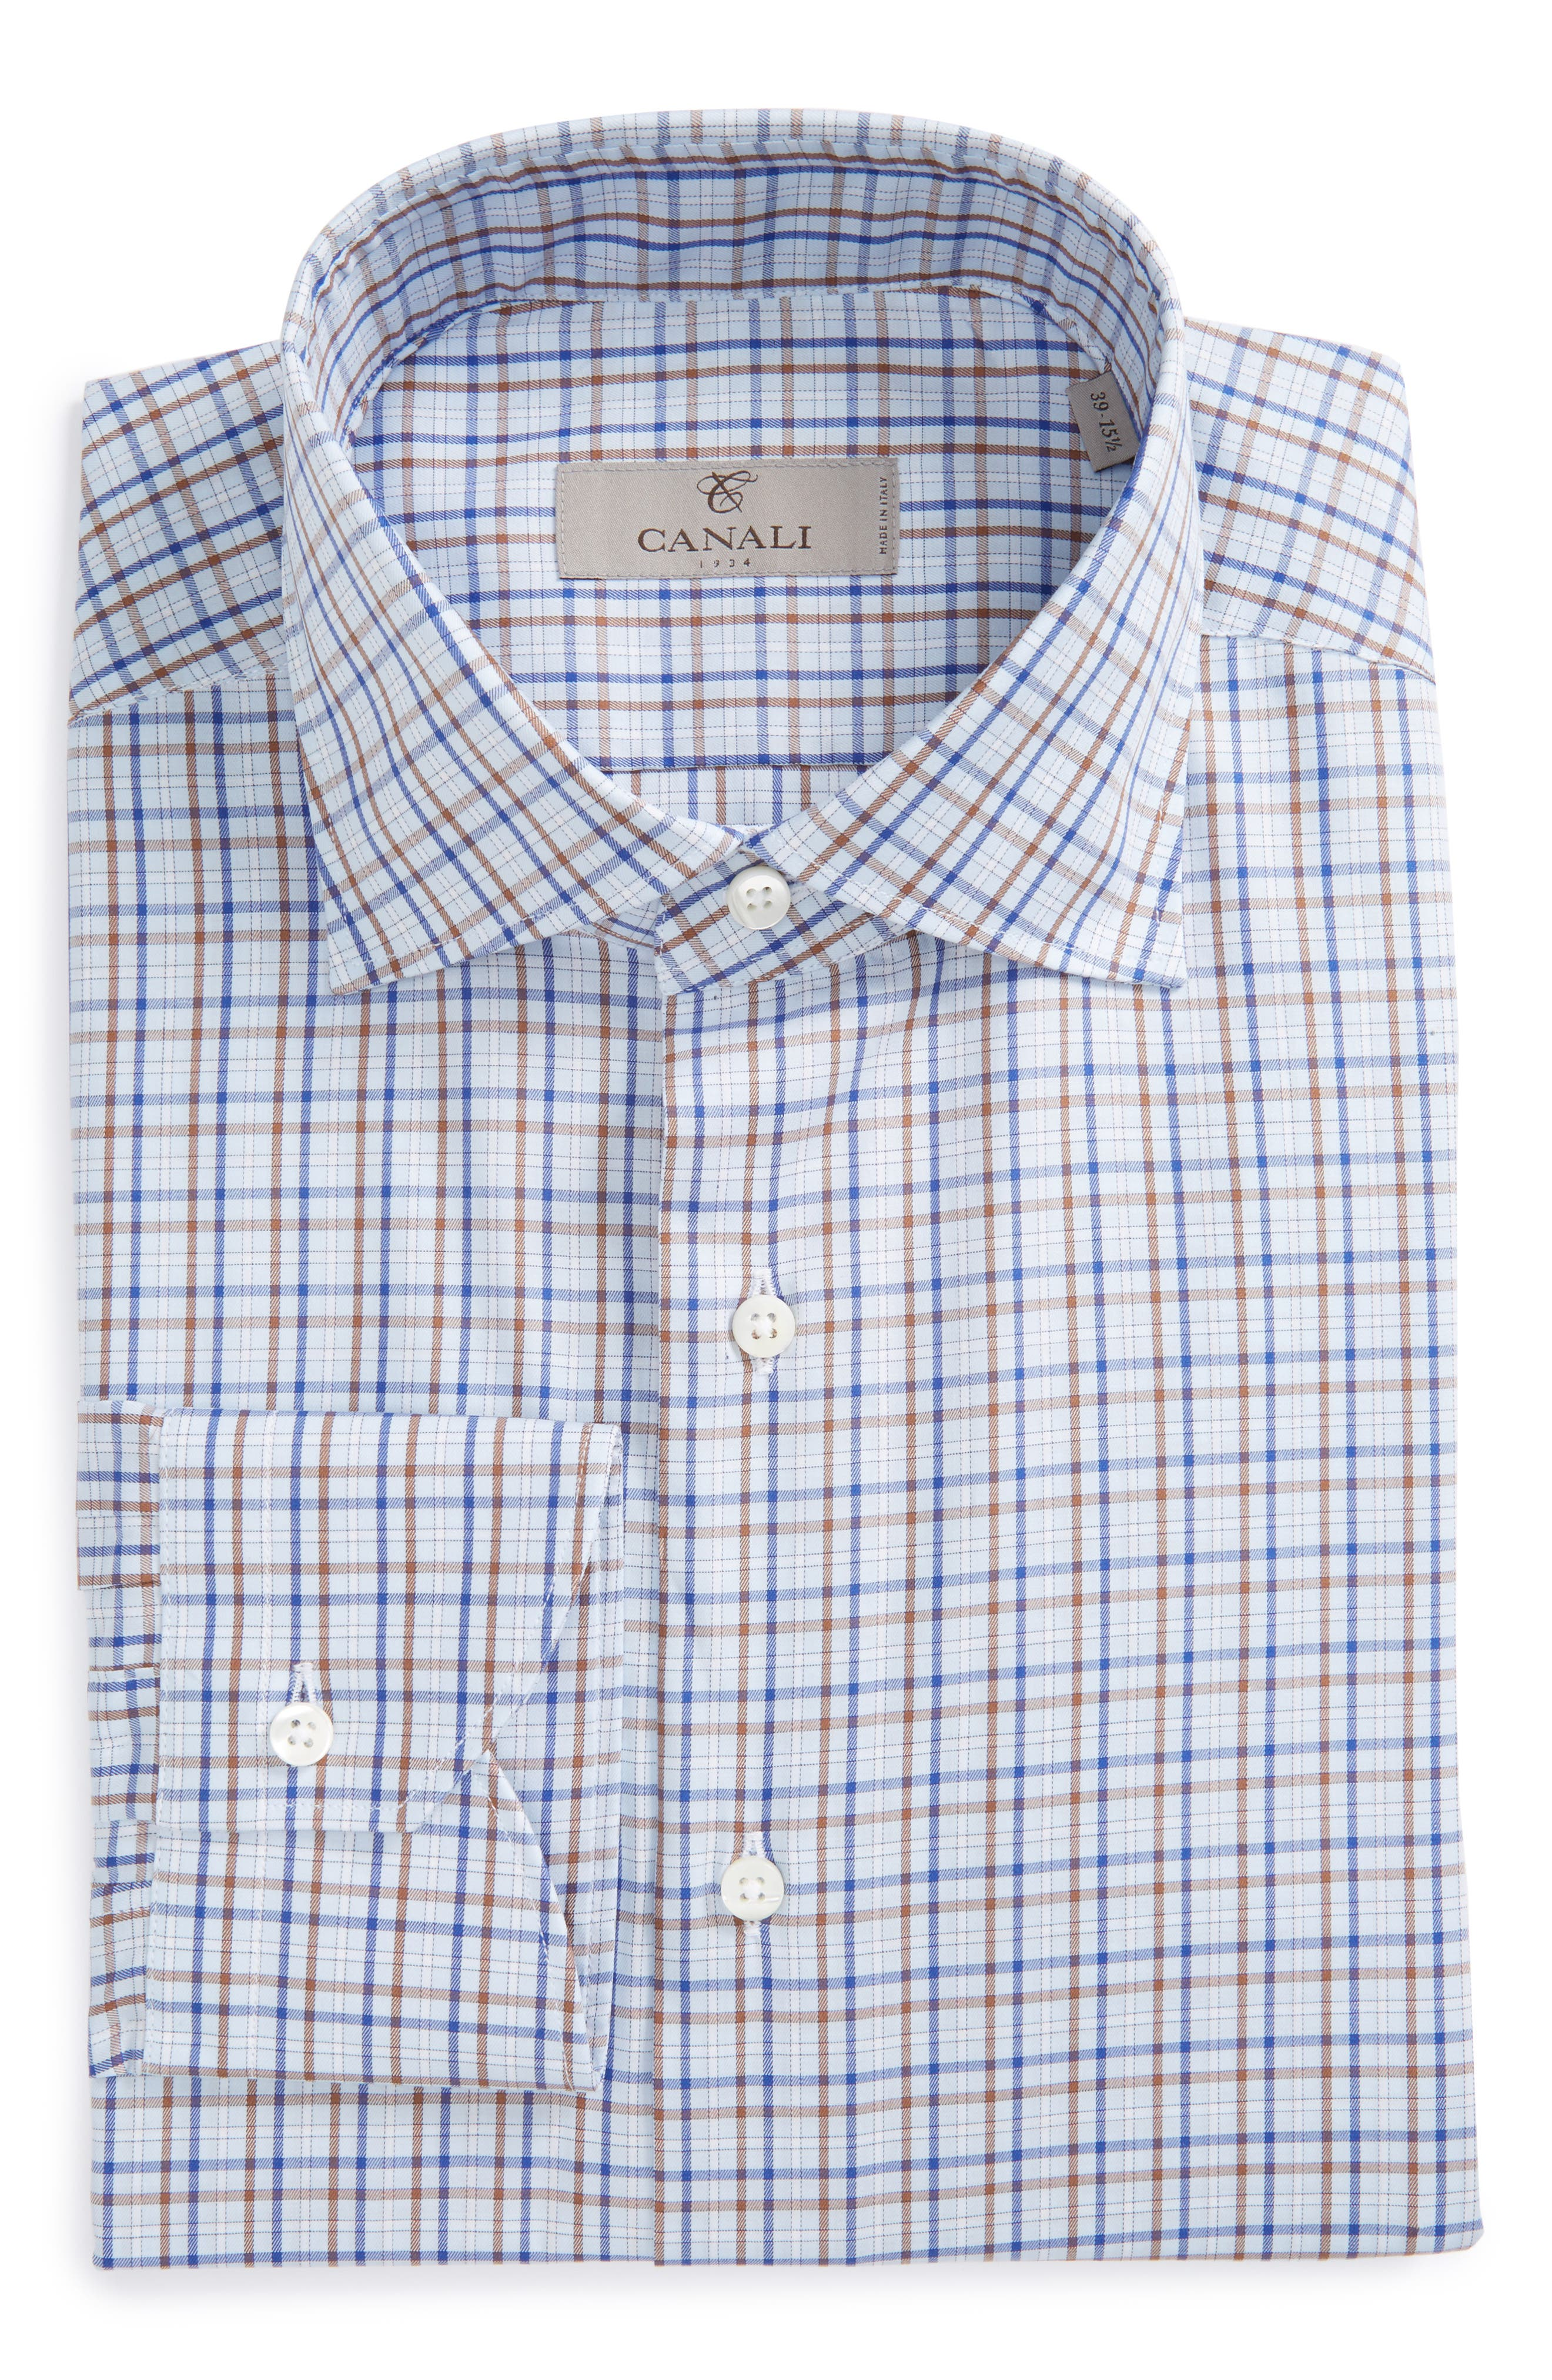 Alternate Image 1 Selected - Canali Regular Fit Check Dress Shirt